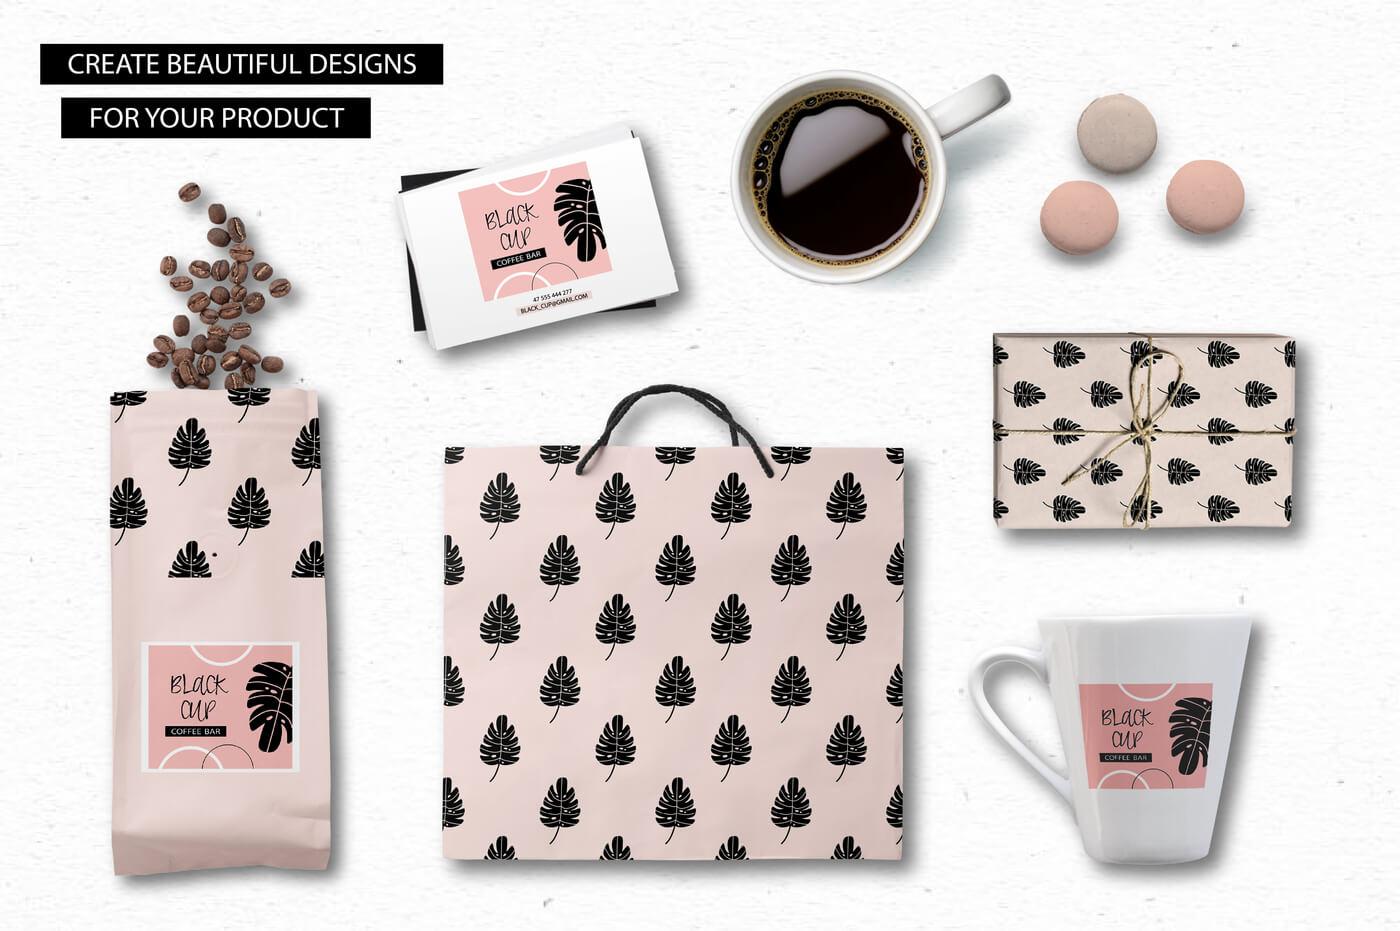 Spring Blooms clip art +branding kit 5